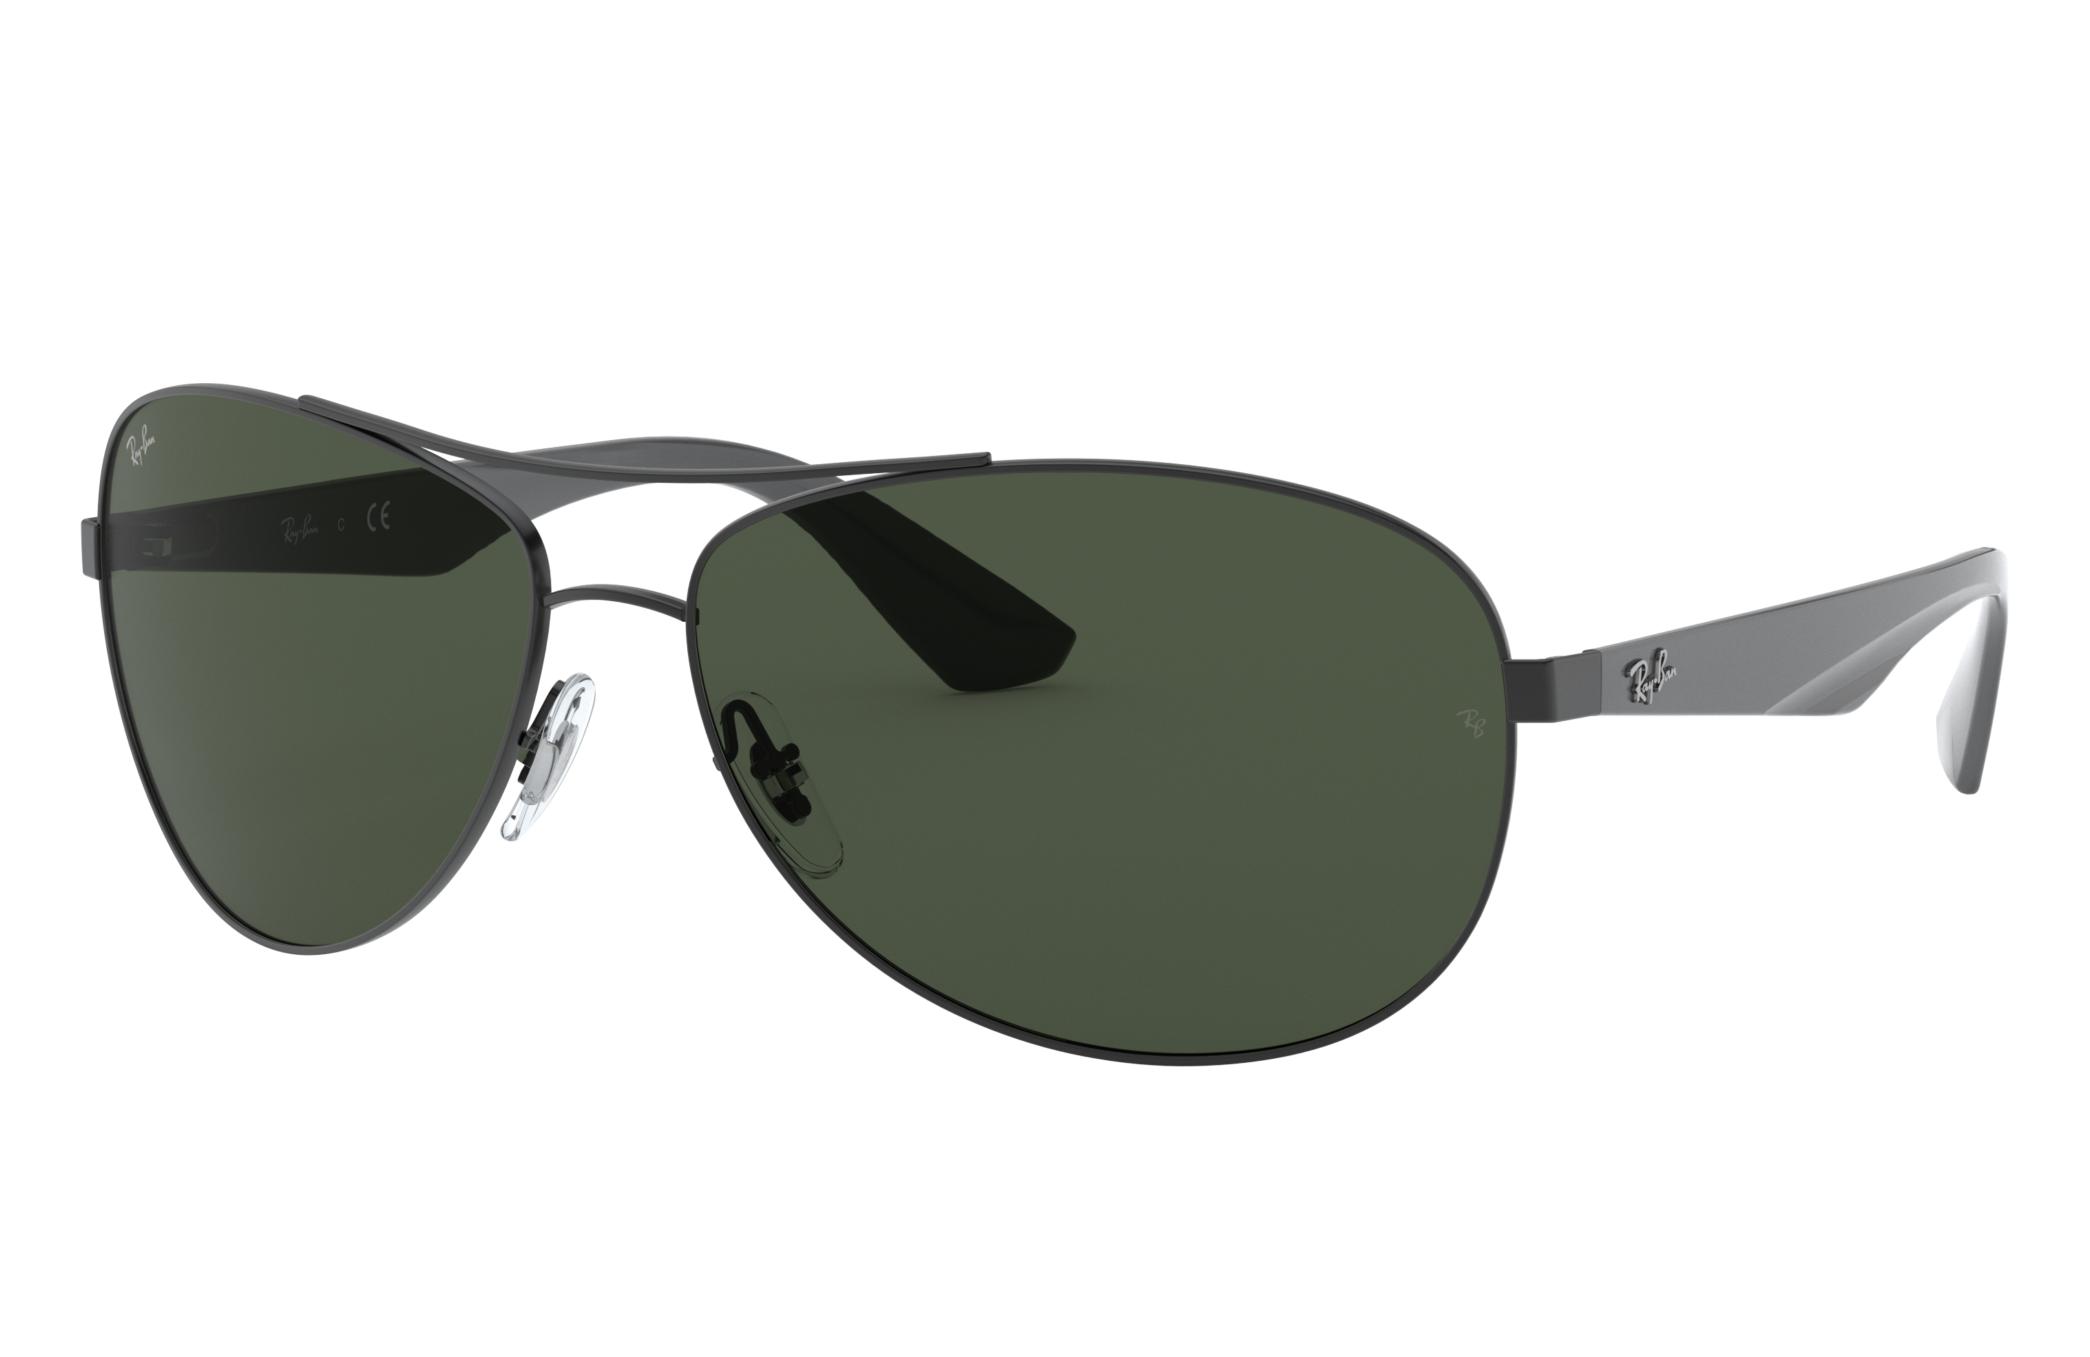 Ray-Ban Rb3526 Grey, Green Lenses - RB3526